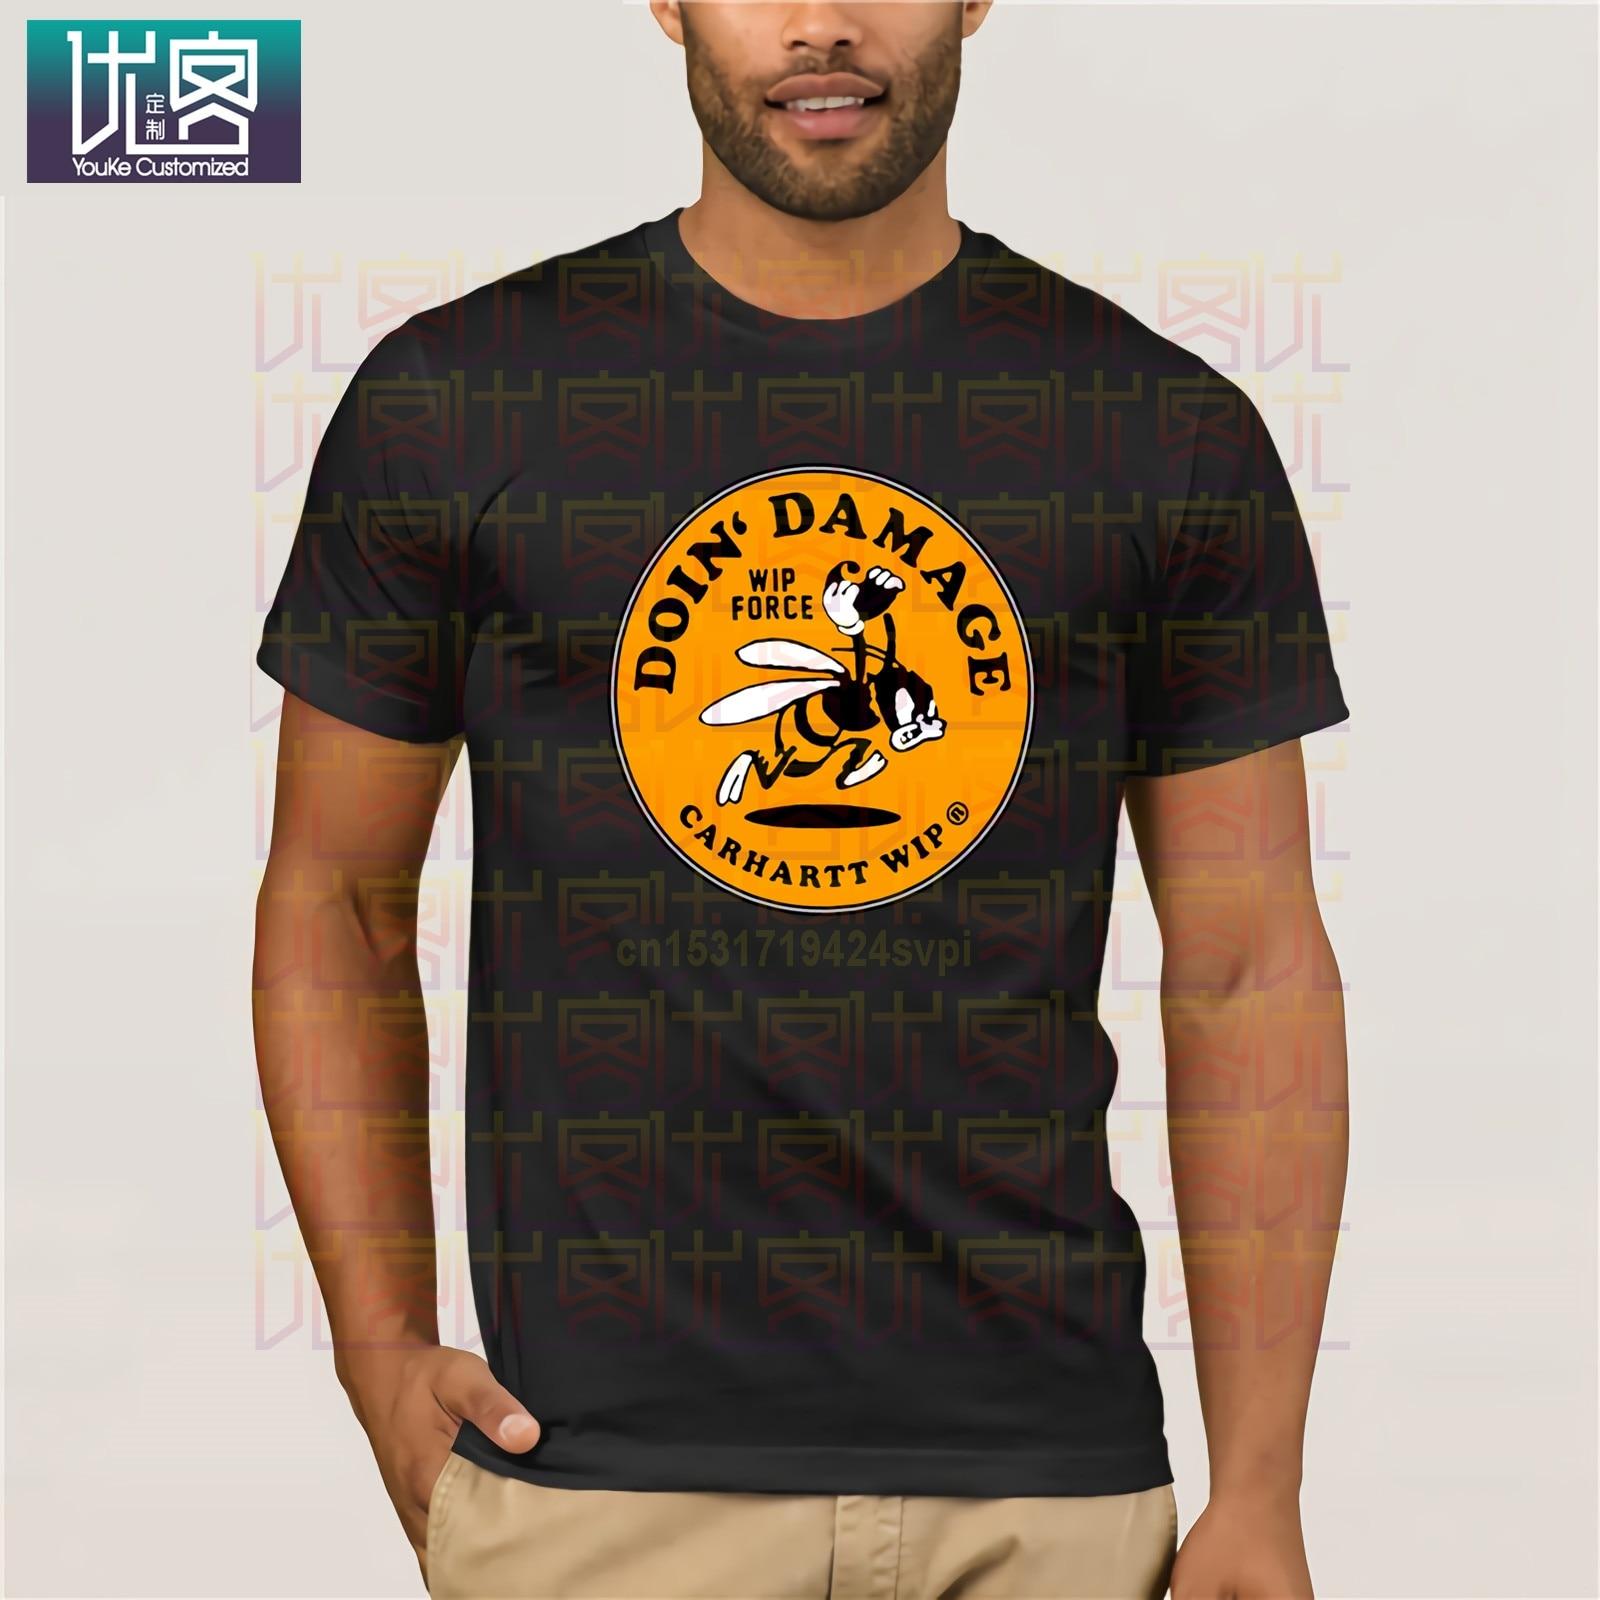 Carhart  Logo T Shirts Men T-Shirt Tops Tees Brand Clothing Fitness Streetwear T Shirts Plus Size